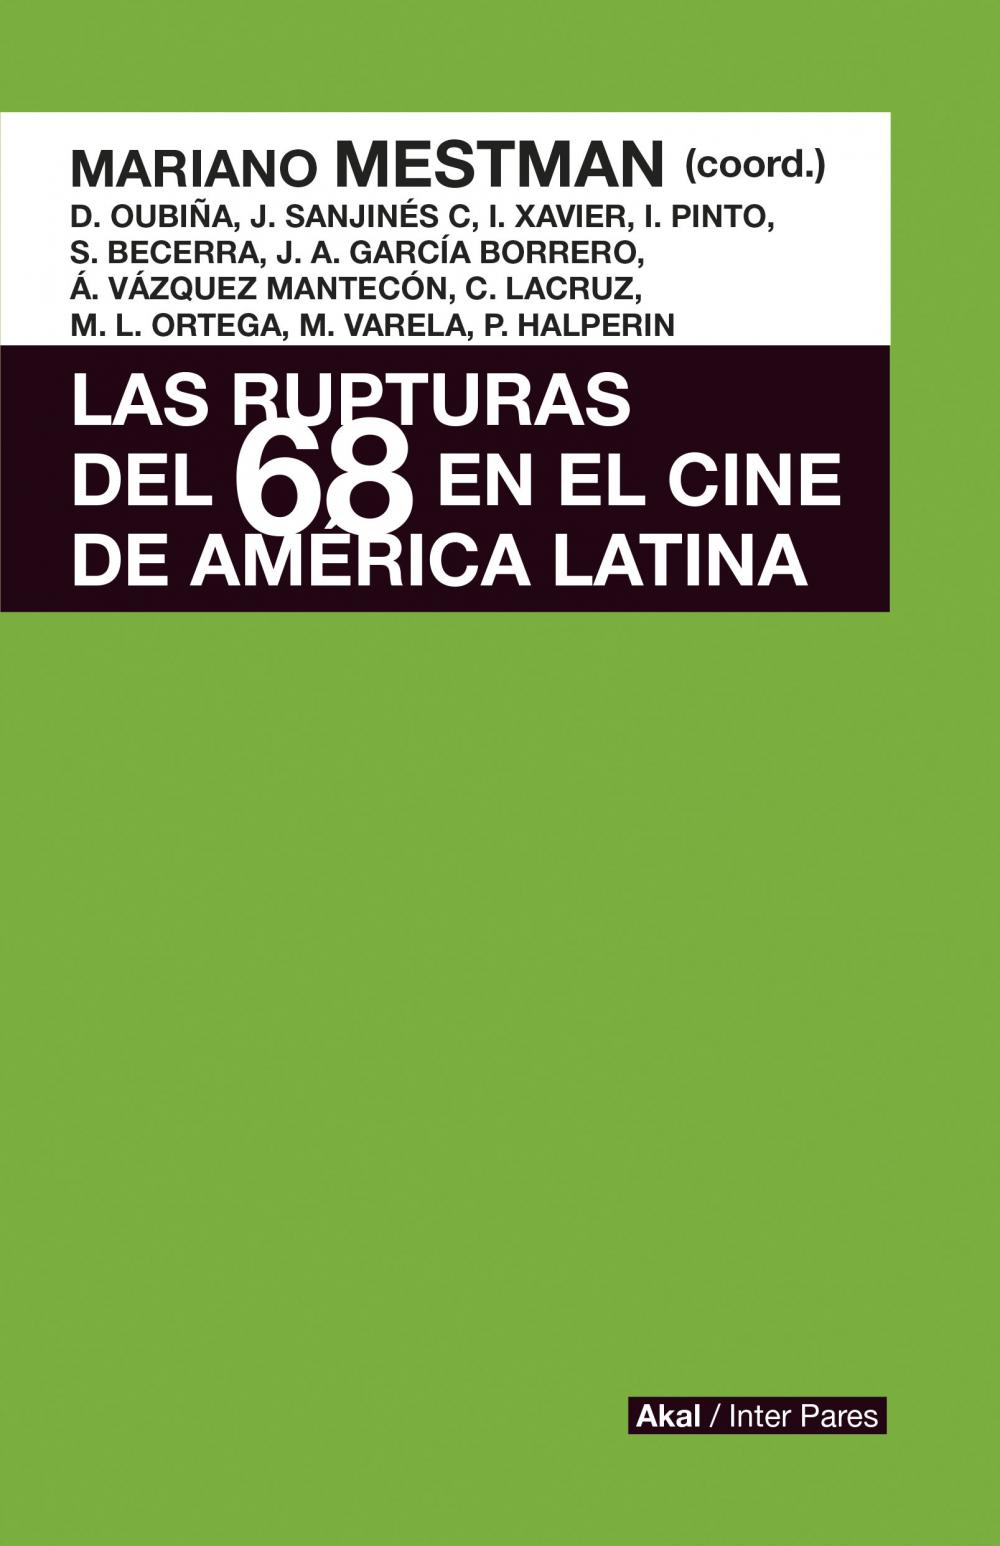 LAS RUPTURAS DEL 68 EN EL CINE DE AMÉRICA LATINA : CONTRACULTURA, EXPERIMENTACIÓ